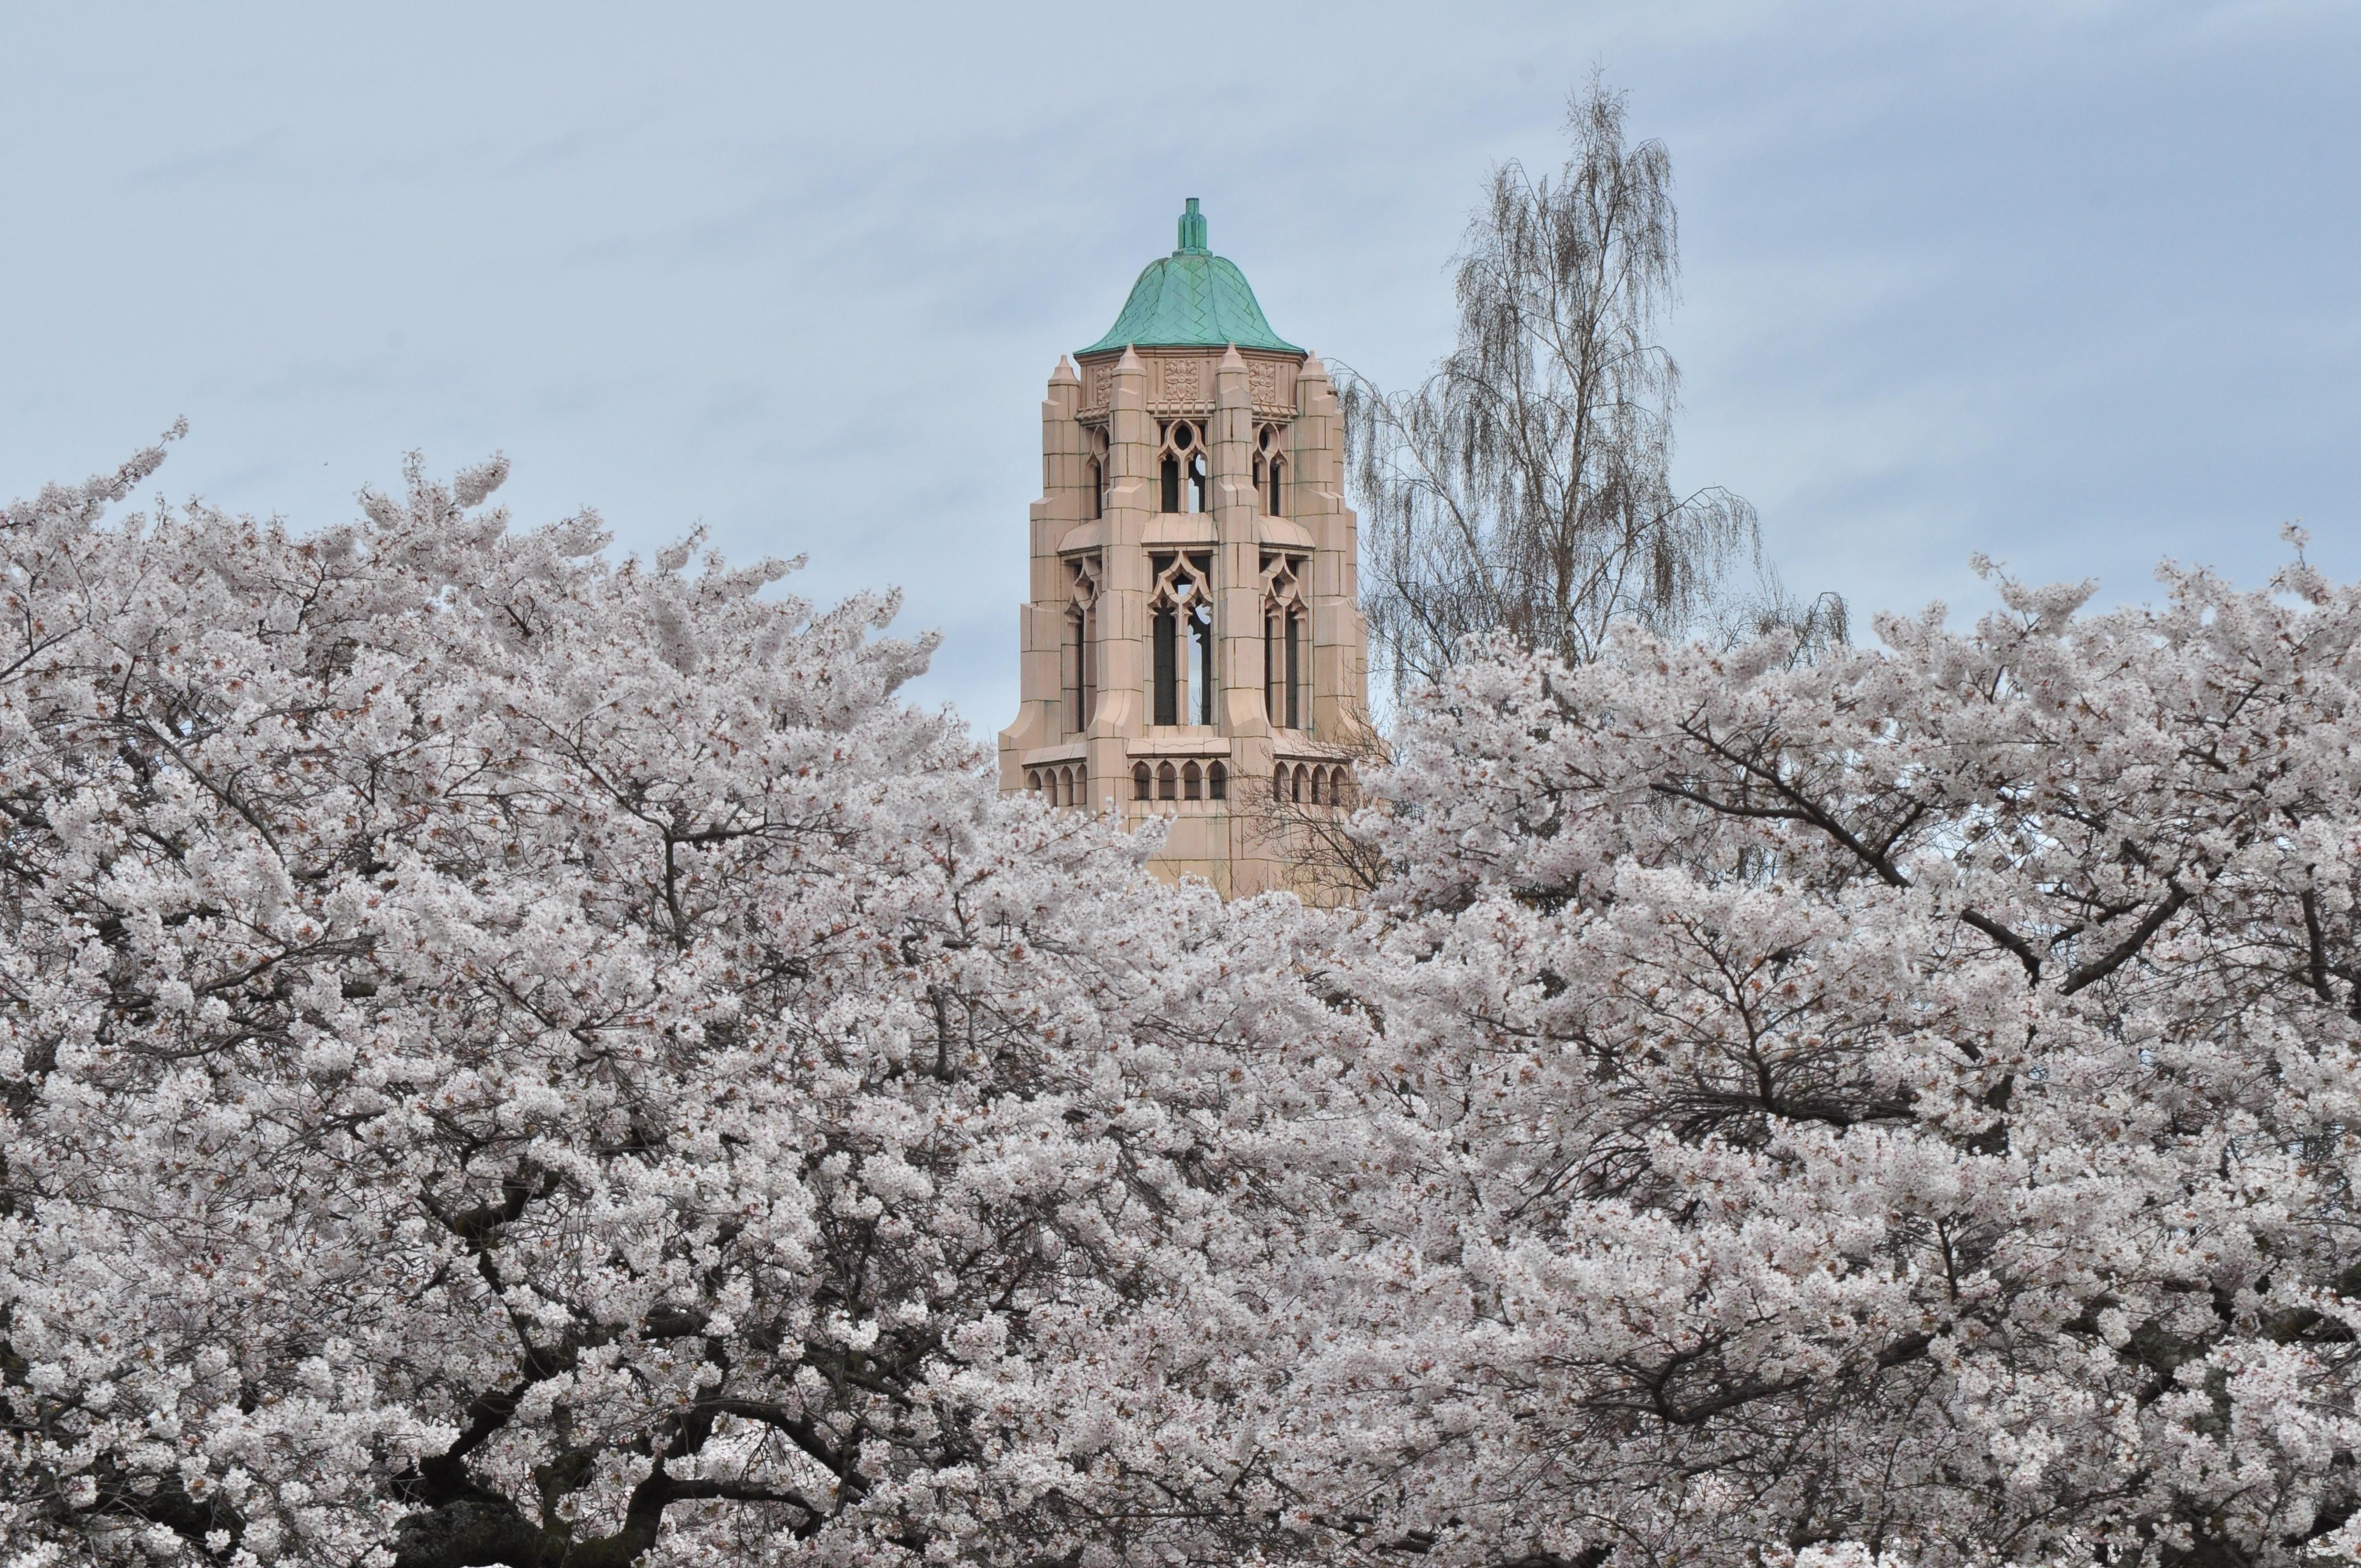 University of Washington Cherry Blossom 2014